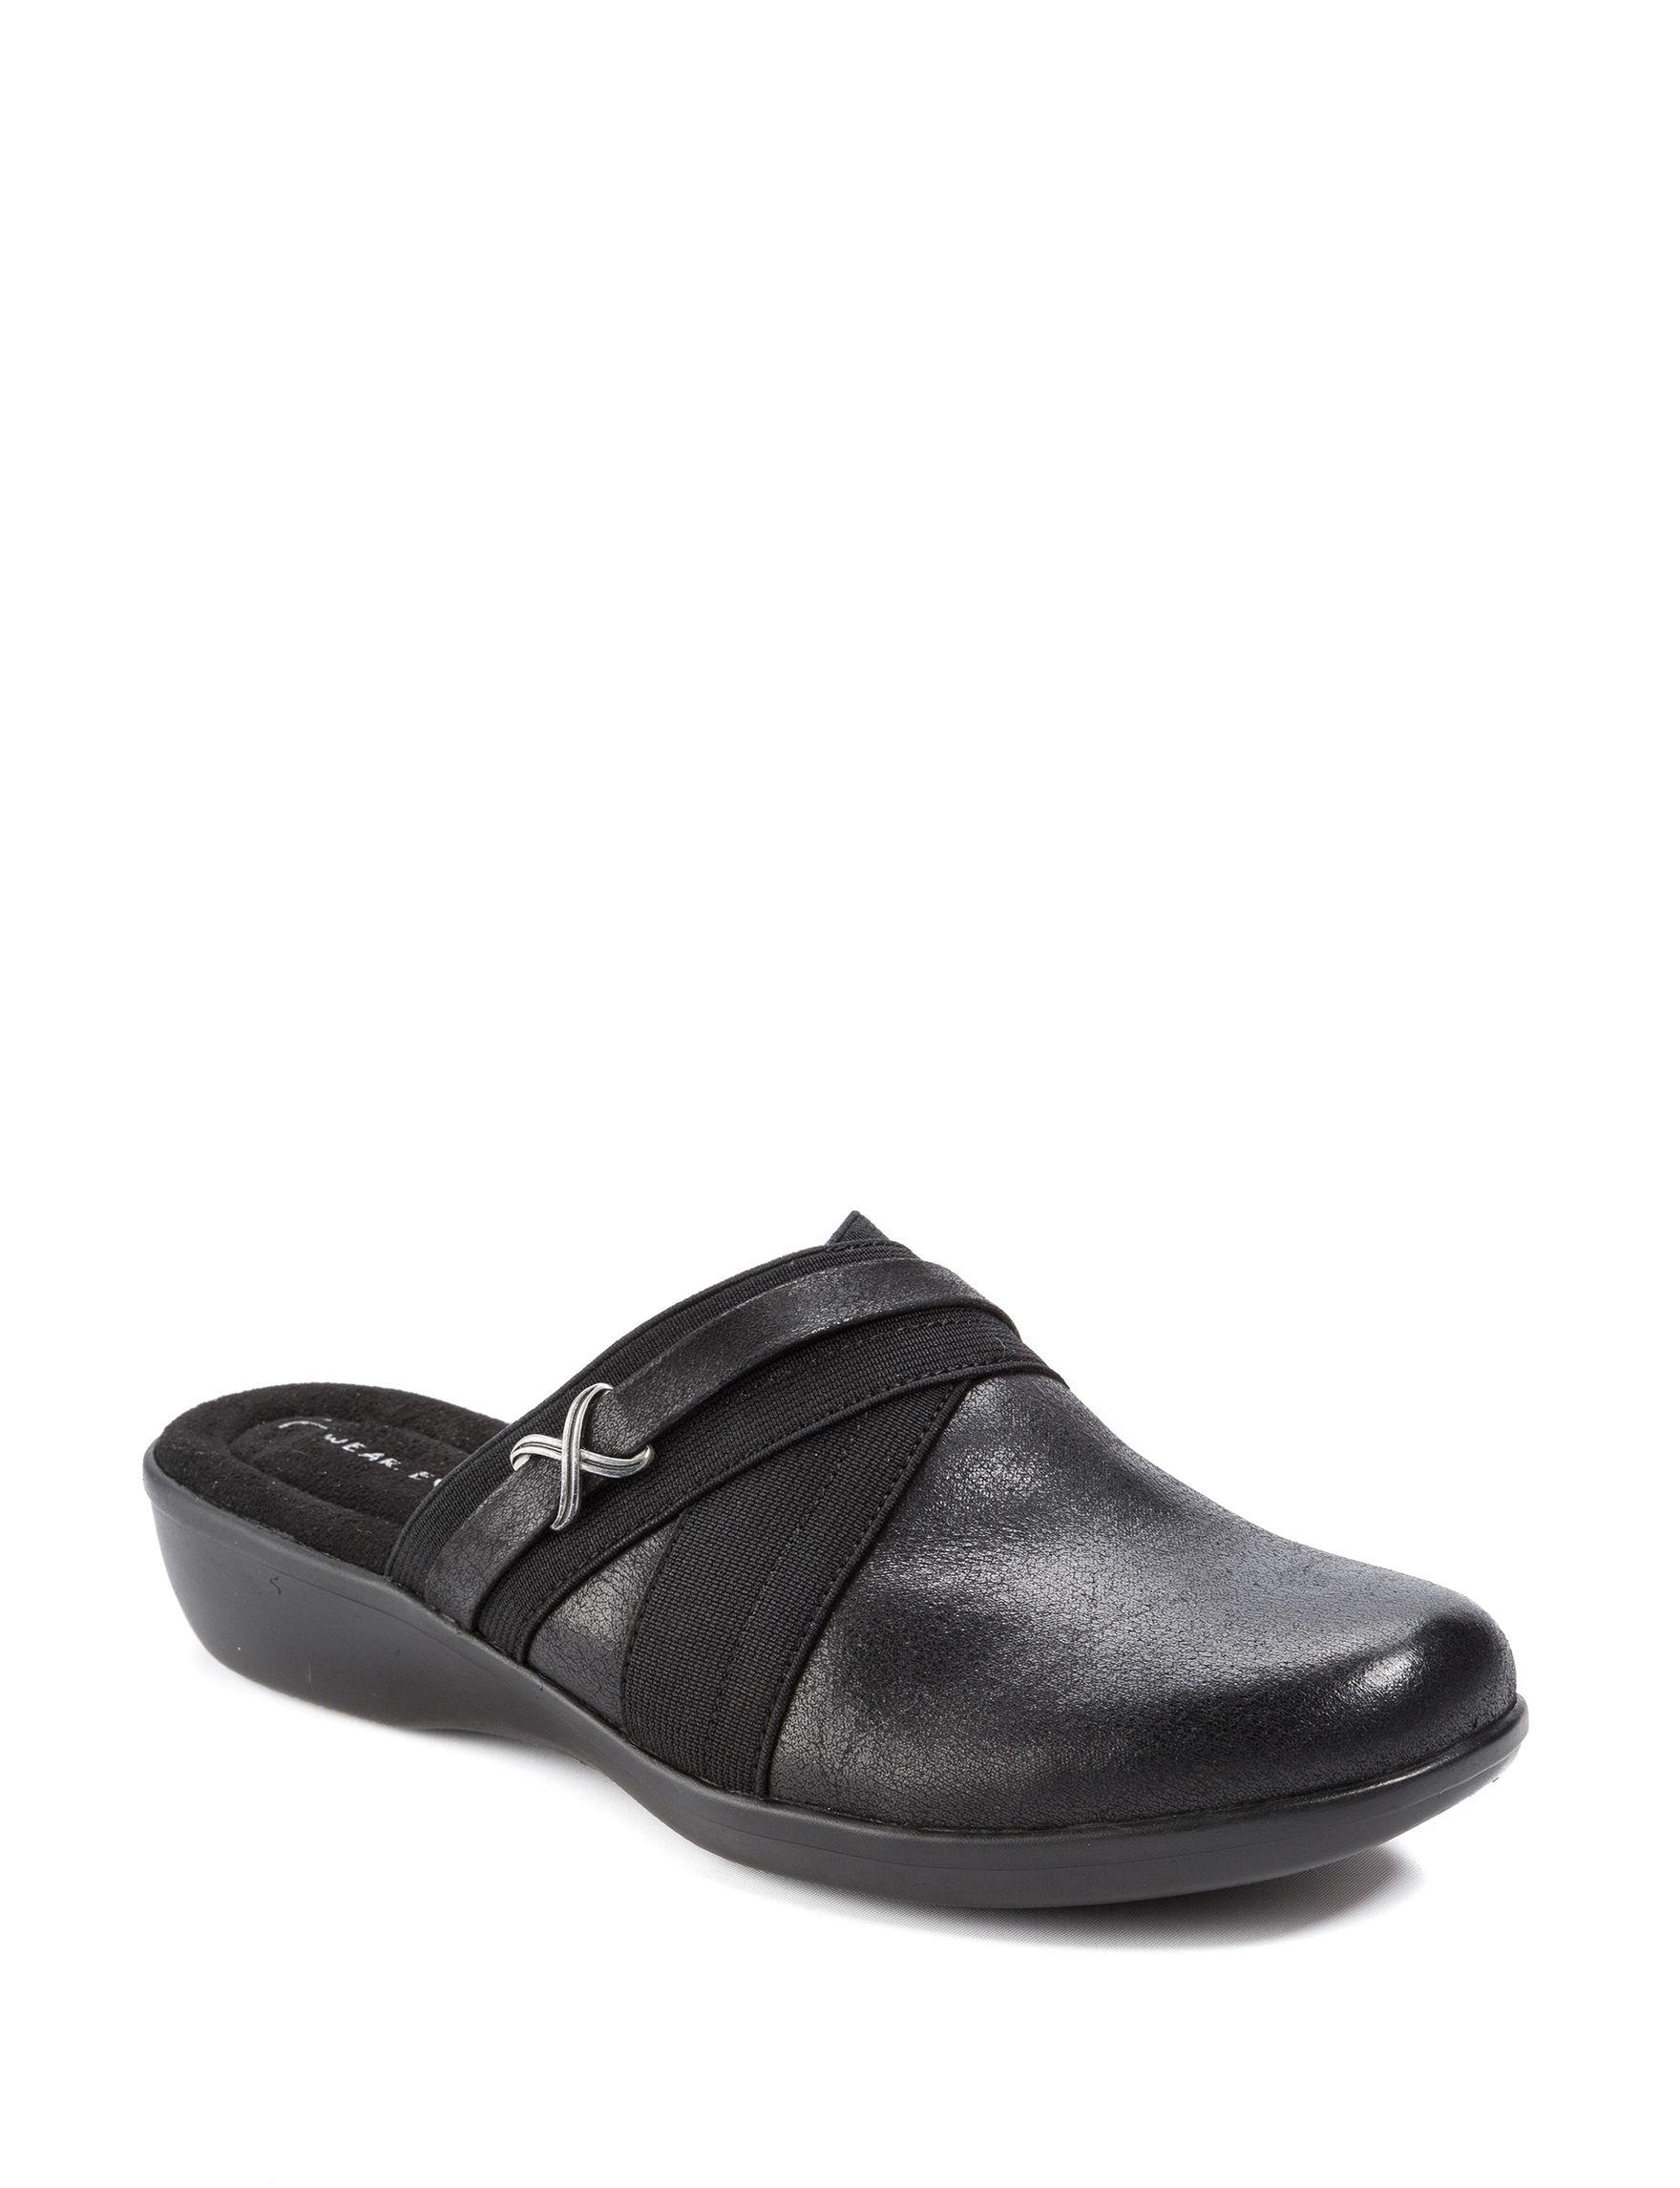 Wear. Ever. Black Comfort Shoes